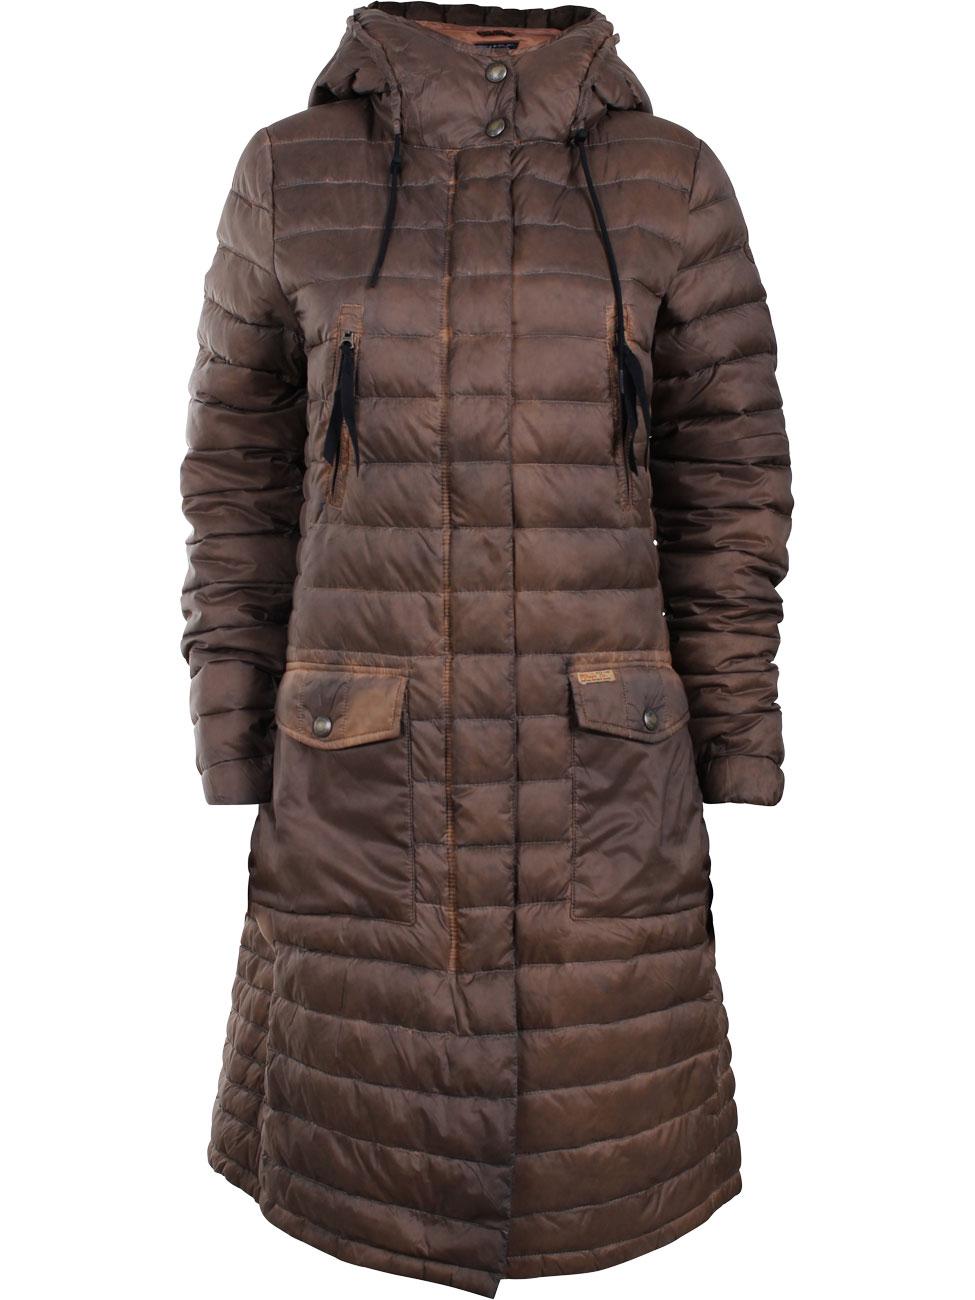 khujo damen mantel rinara mit kapuze kaufen jeans direct de. Black Bedroom Furniture Sets. Home Design Ideas